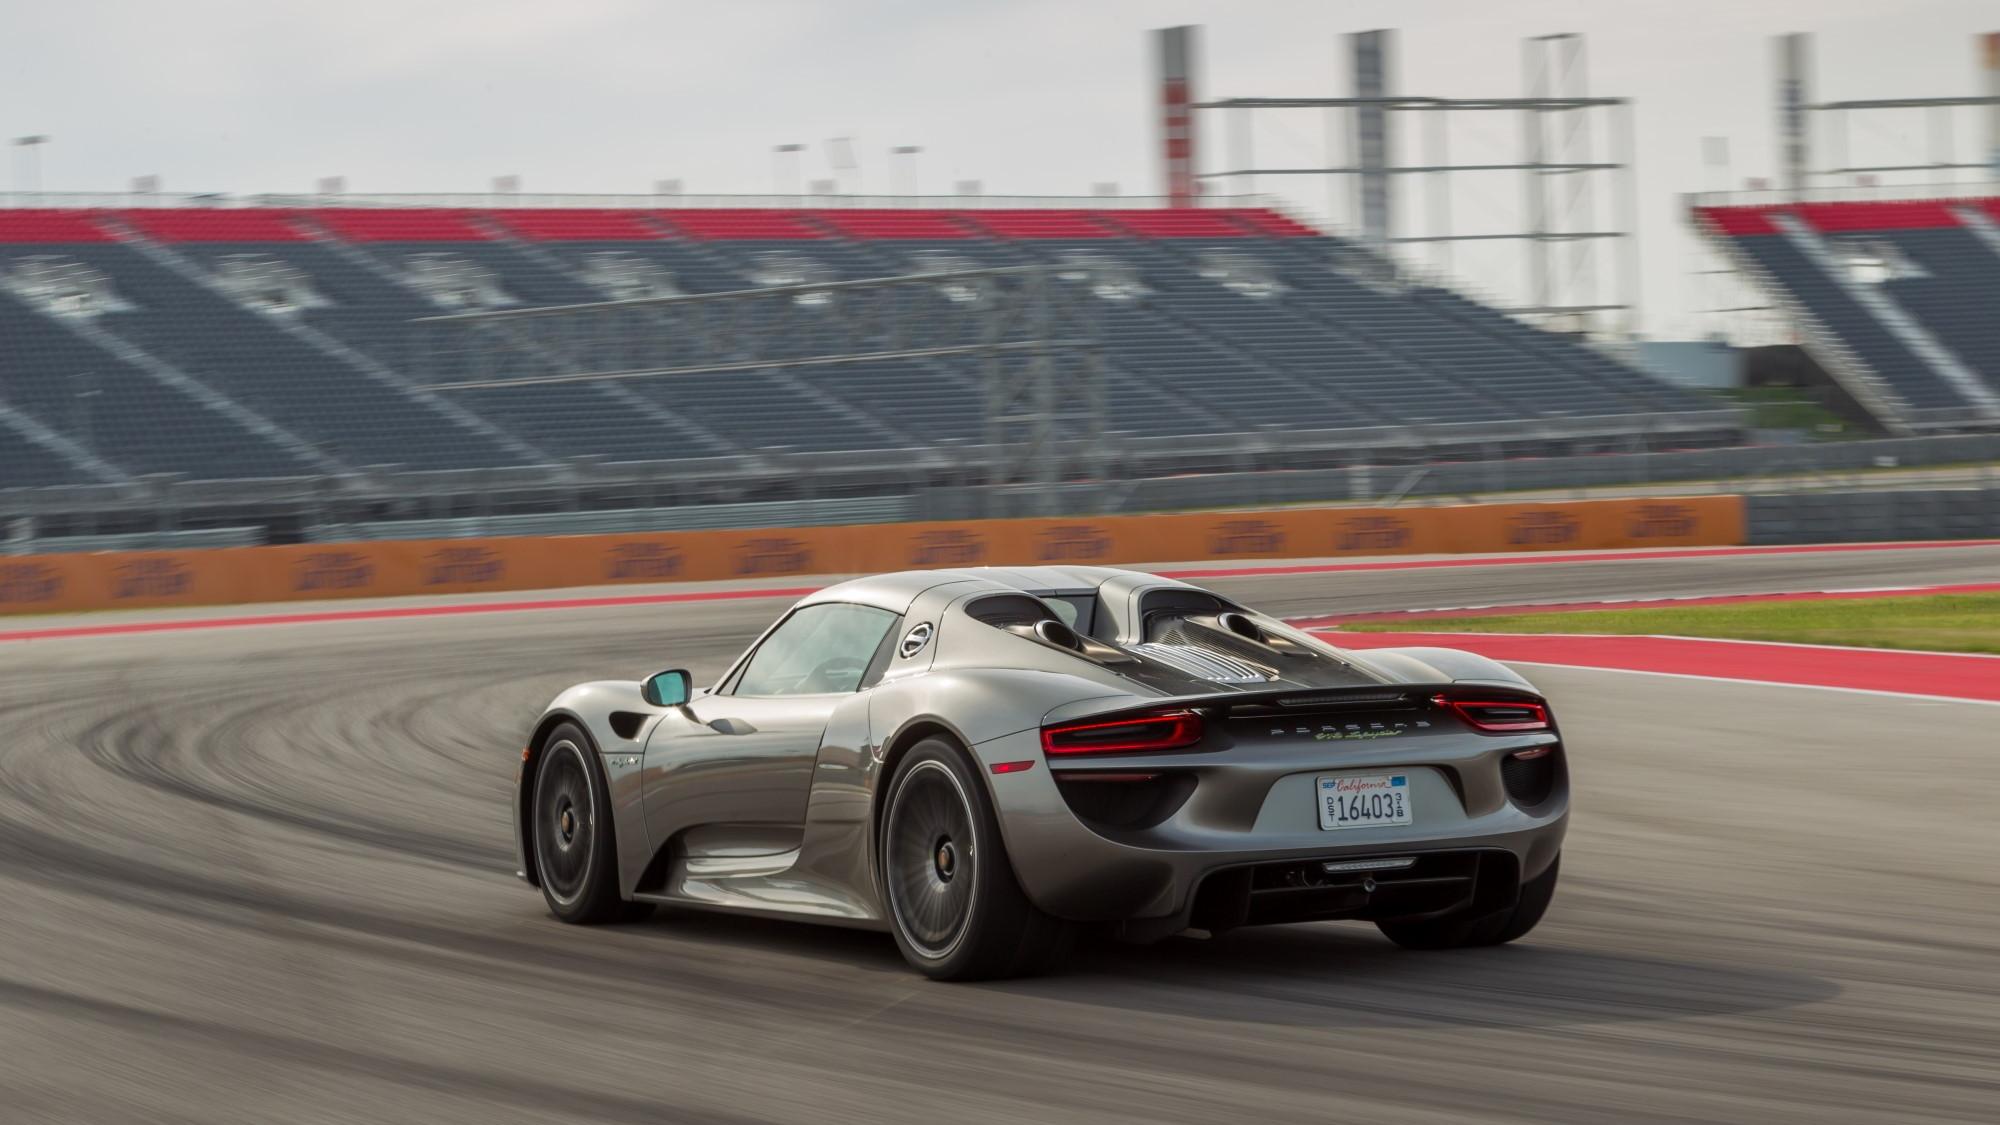 2015 Porsche 918 Spyder Plug In Hybrid Supercar Driven